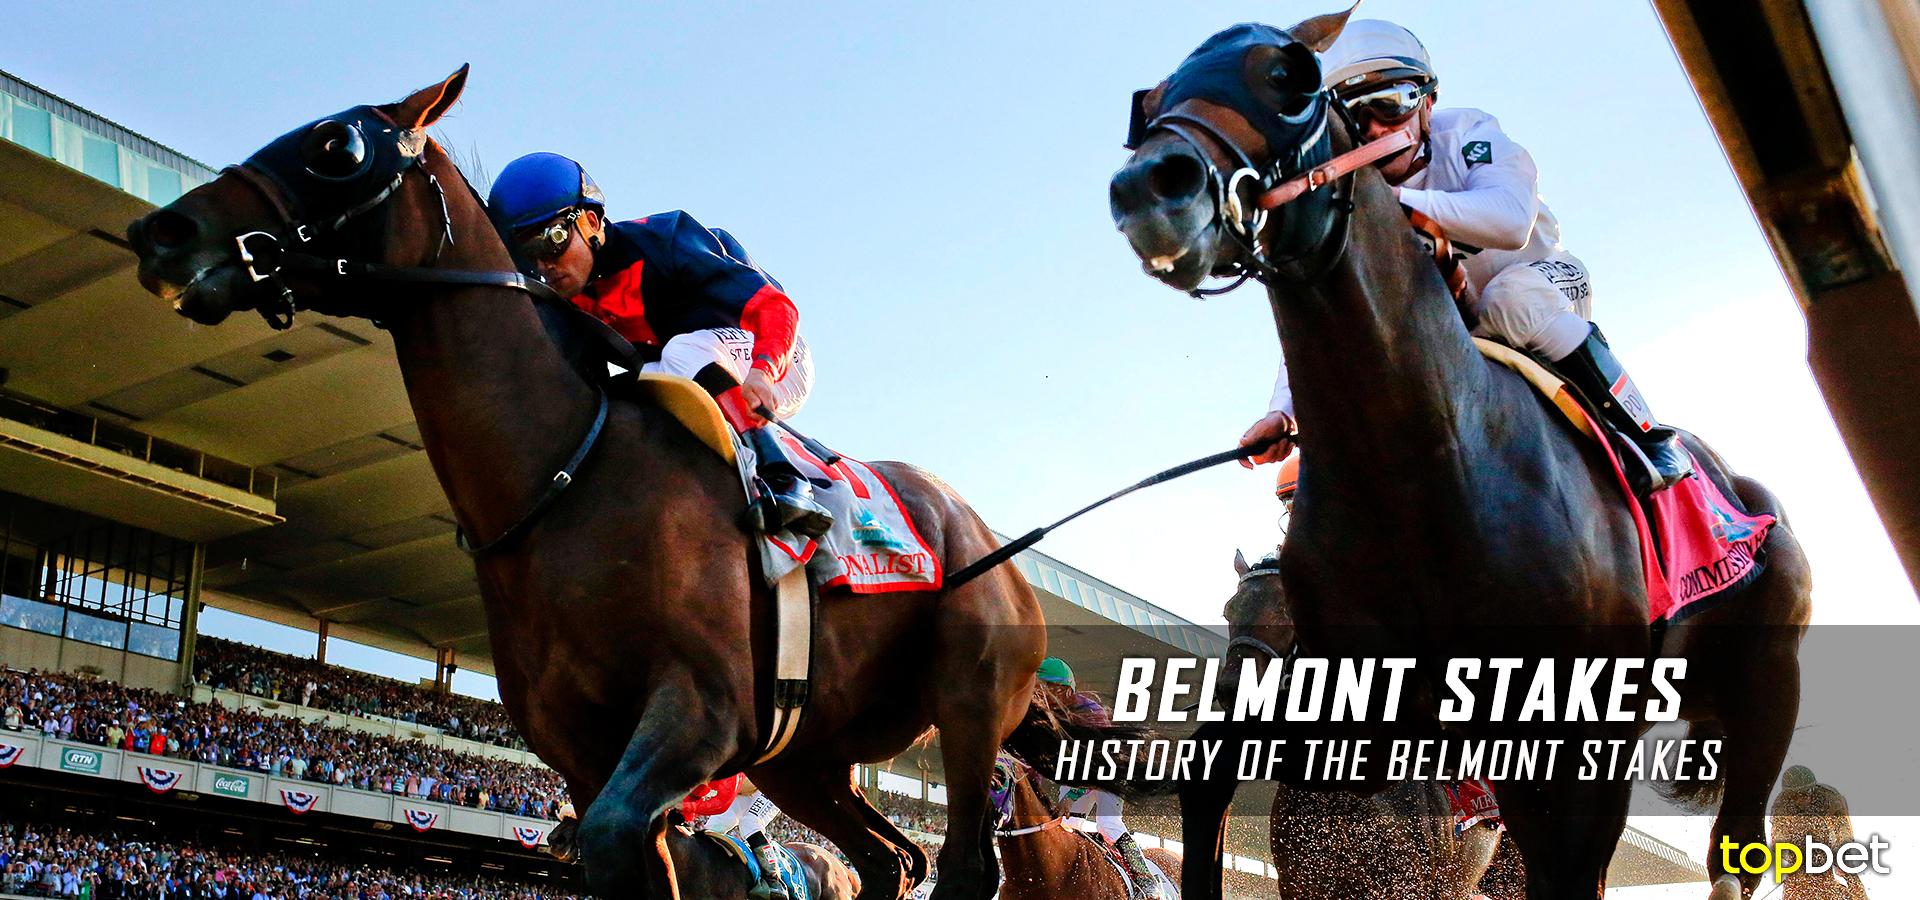 Belmont gambling stakes bonus casino coupon deposit new new no online player rtg